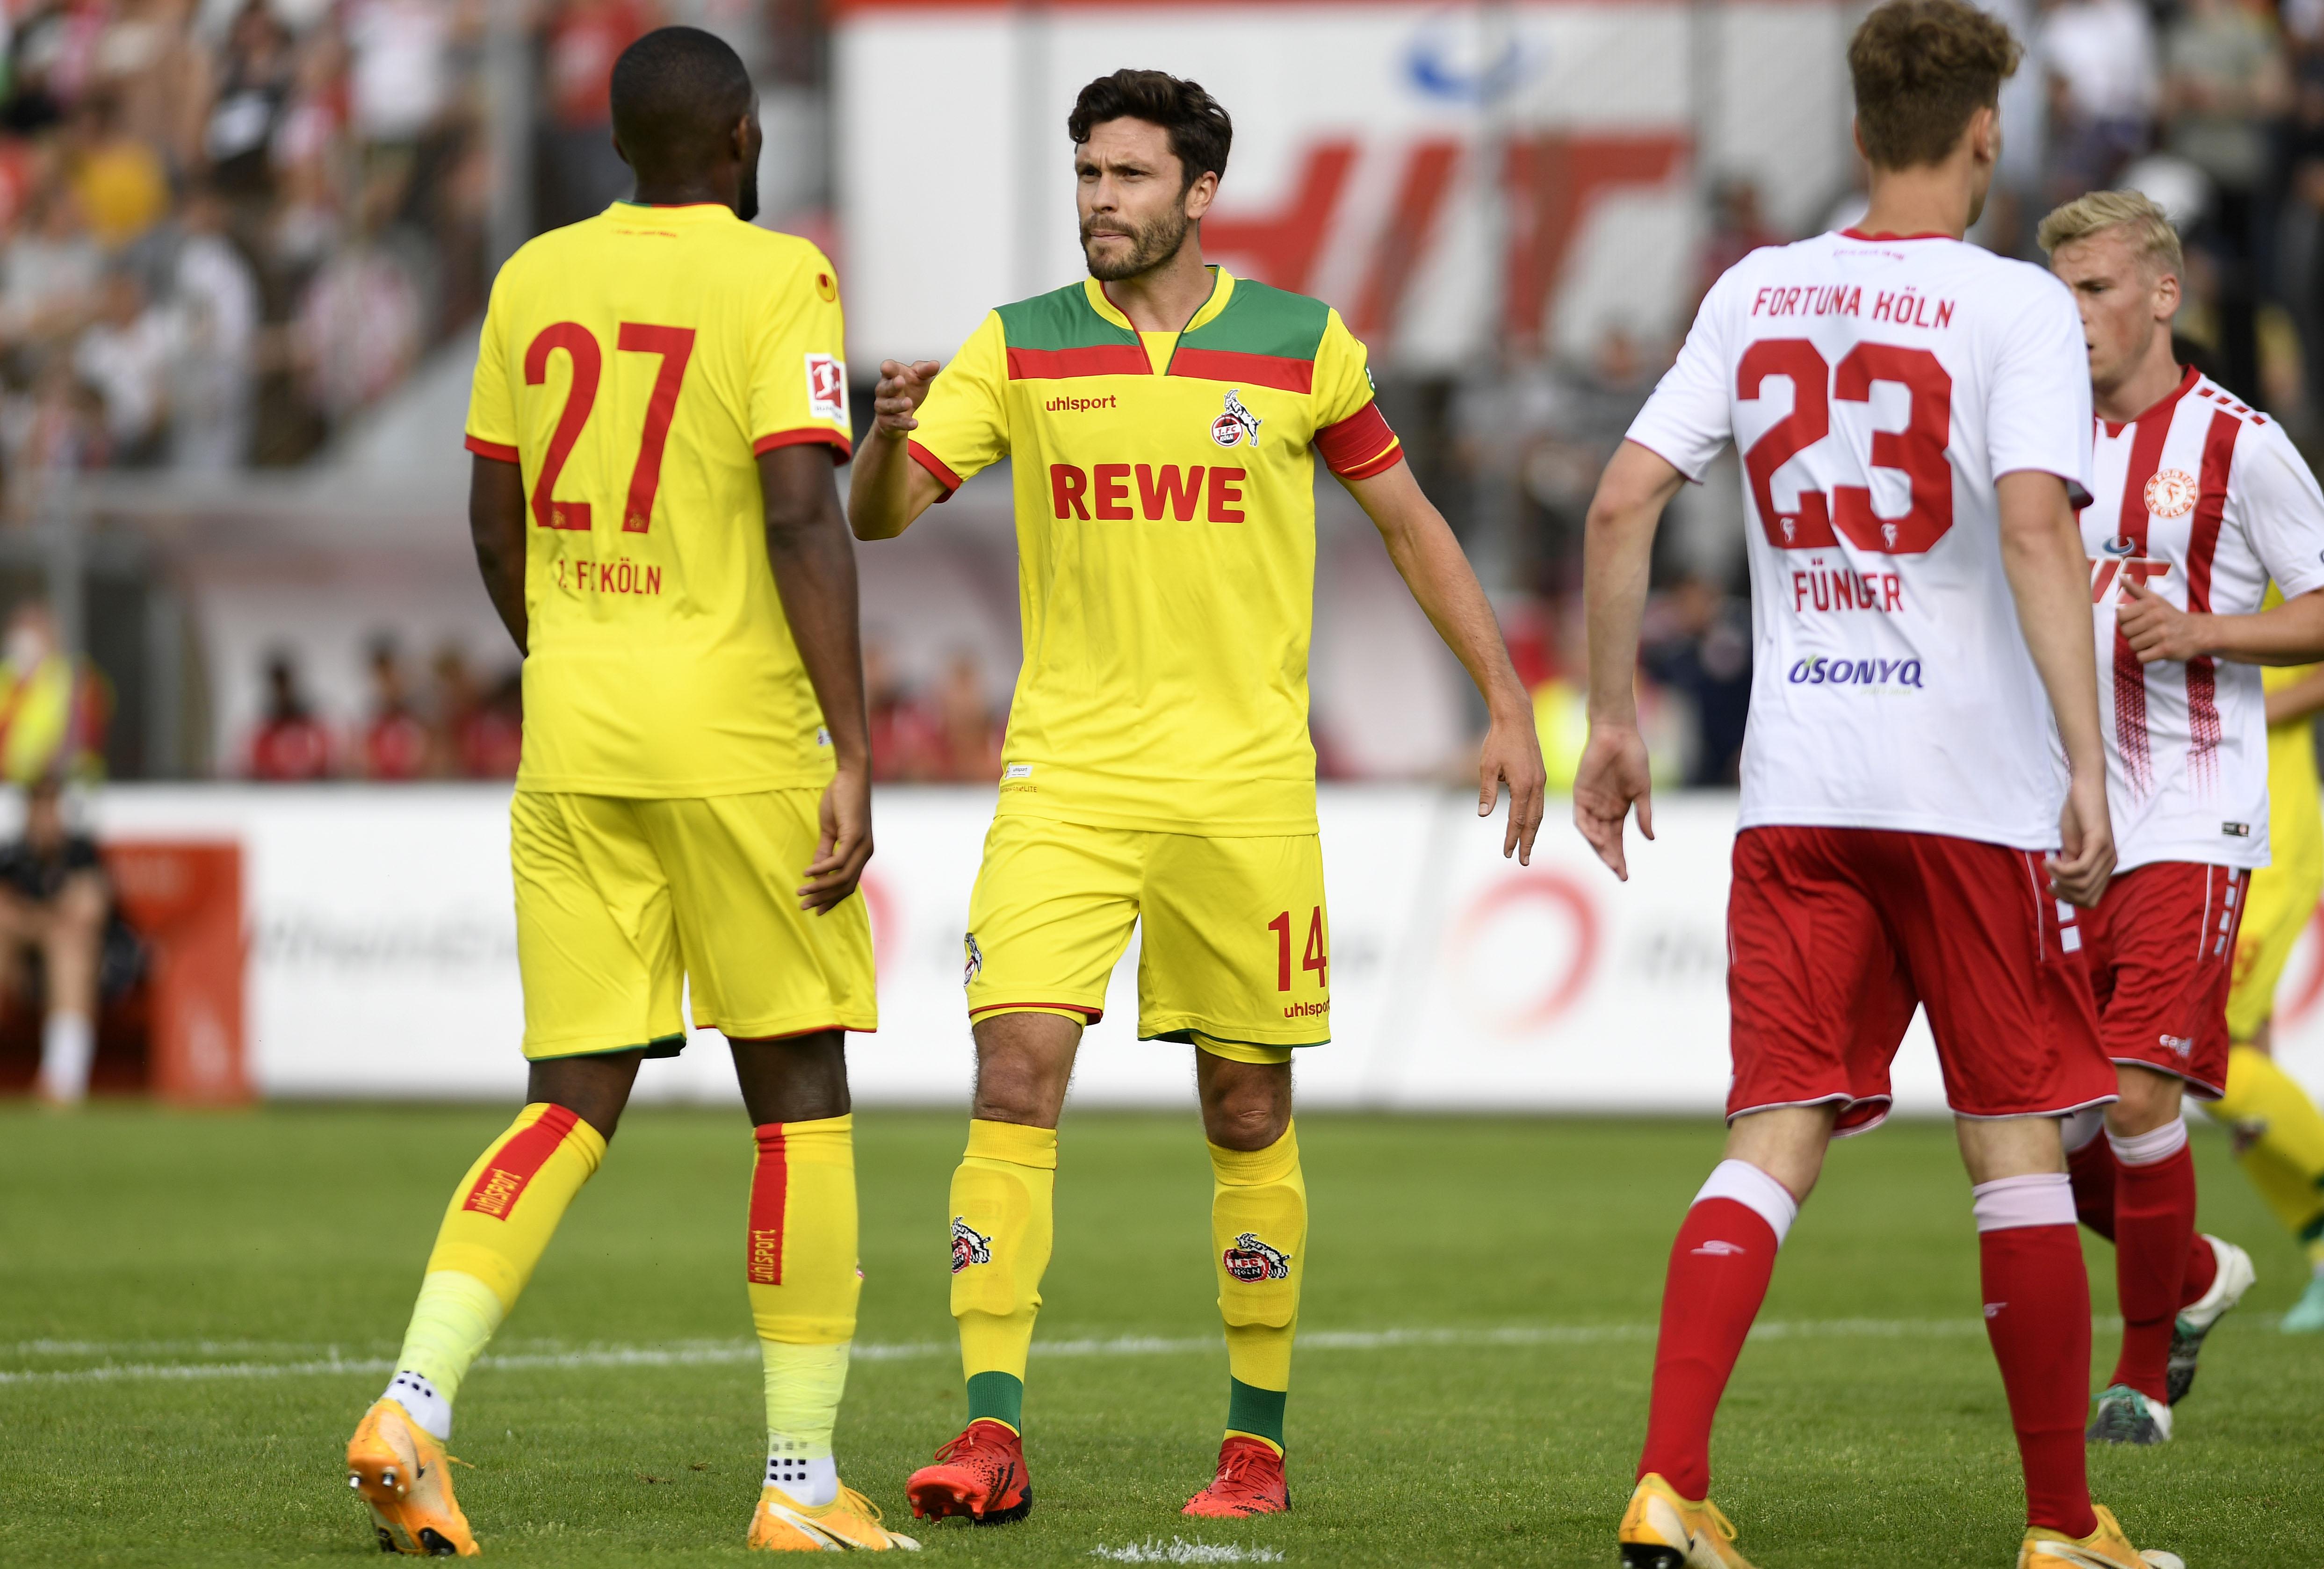 Fortuna Koeln v 1. FC Koeln - Pre-Season Friendly match